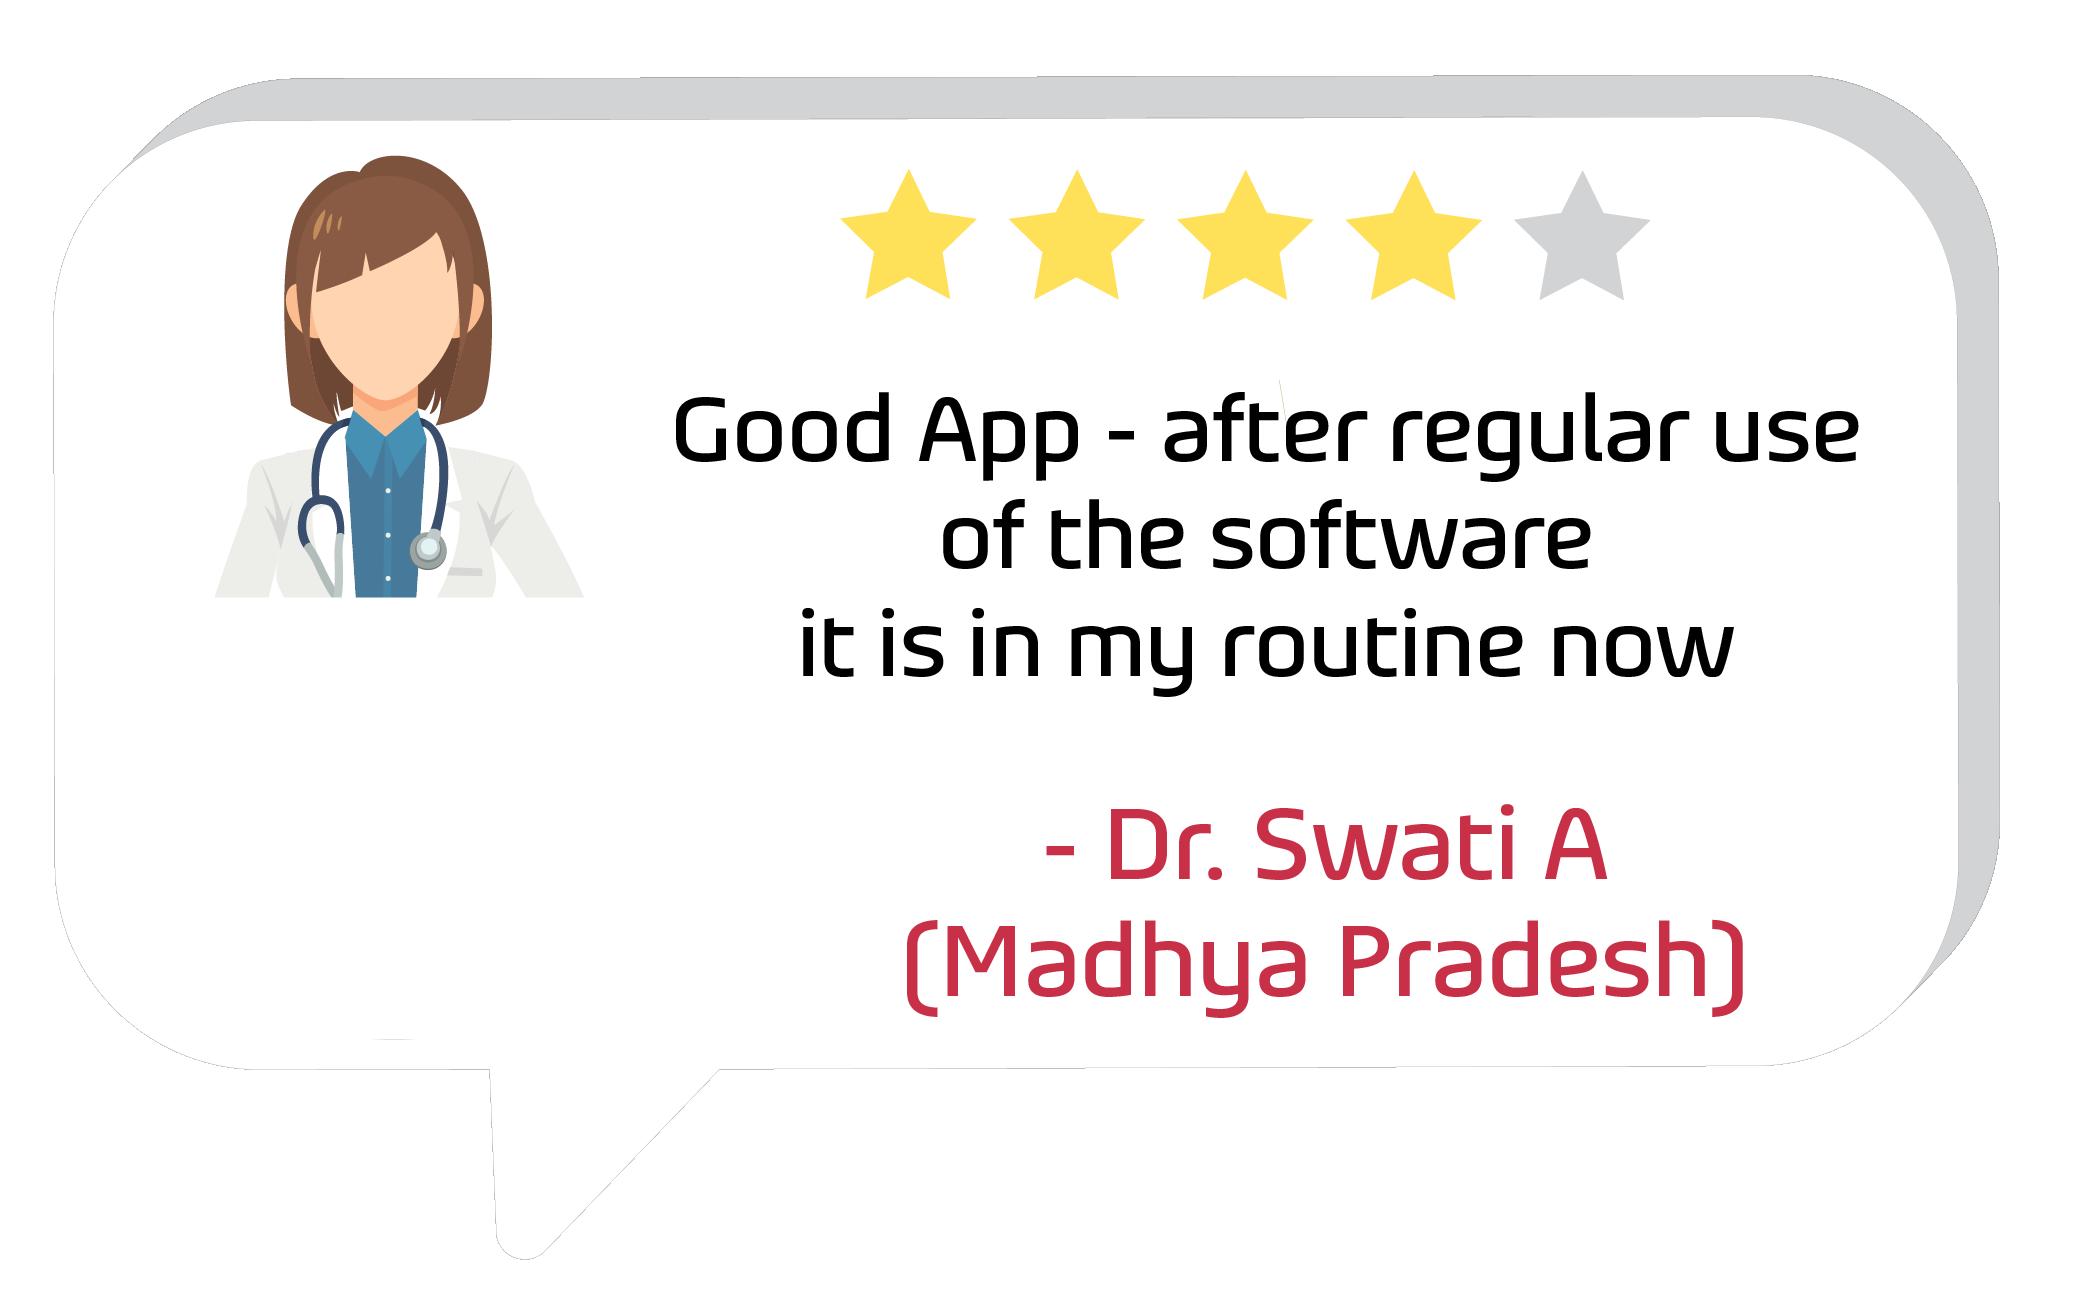 Dr. Swati A